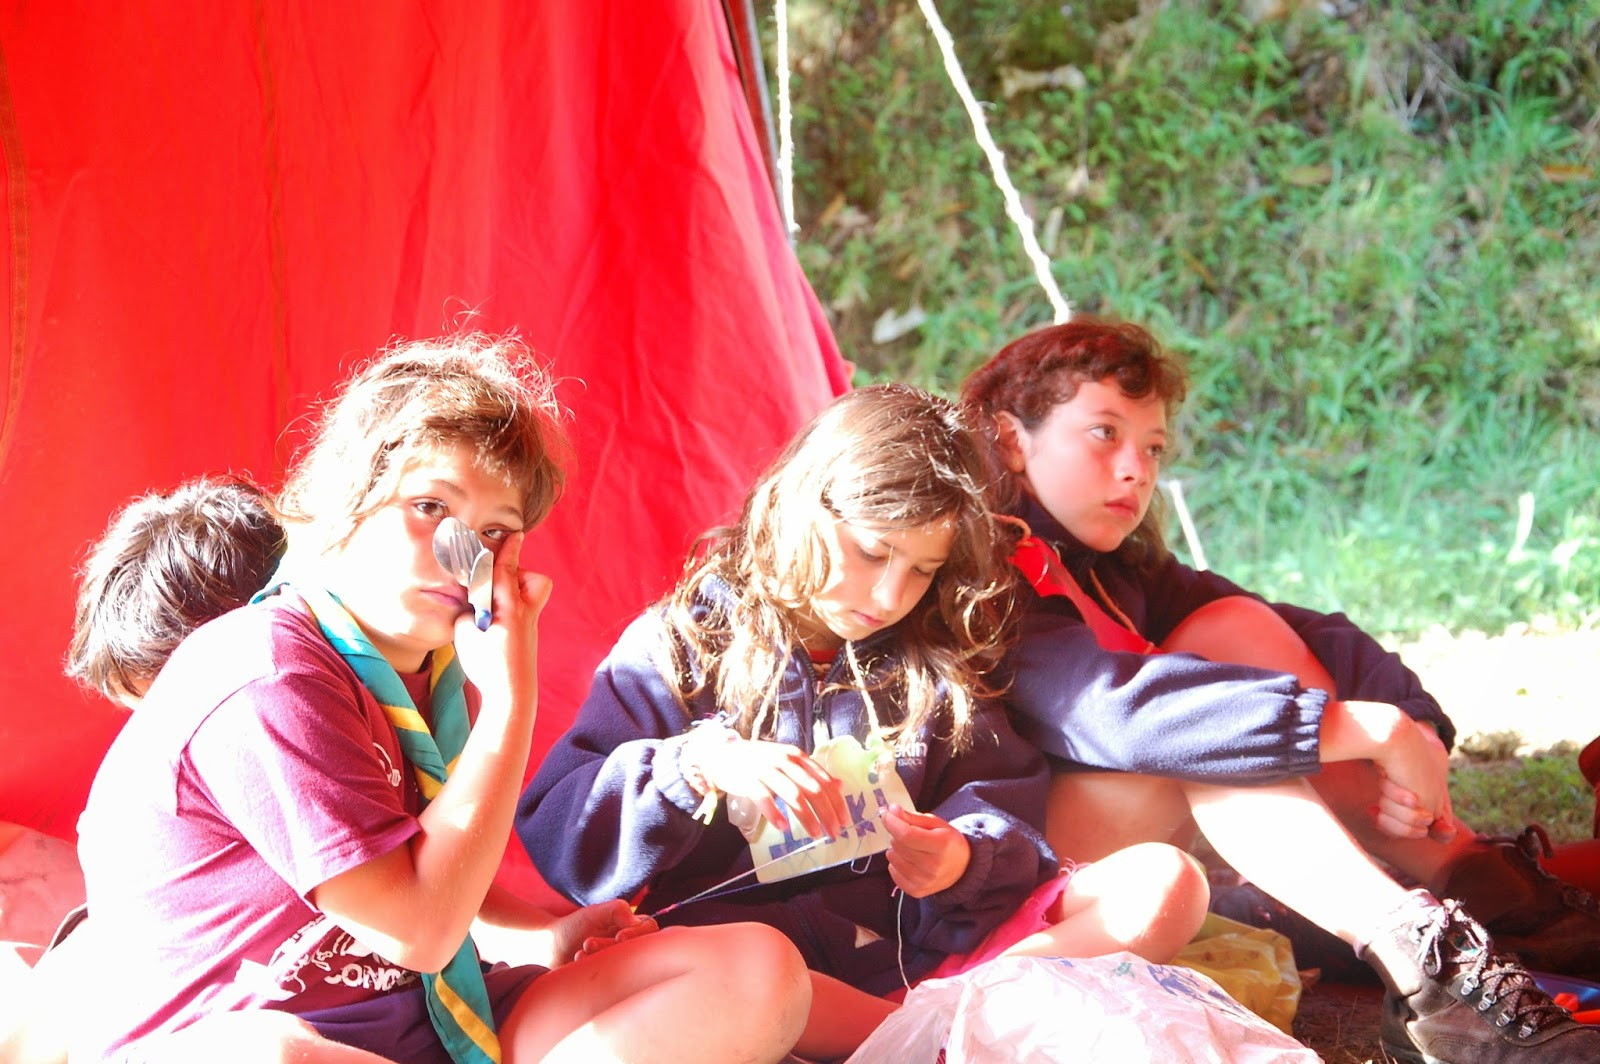 Campaments Estiu RolandKing 2011 - DSC_0045.JPG